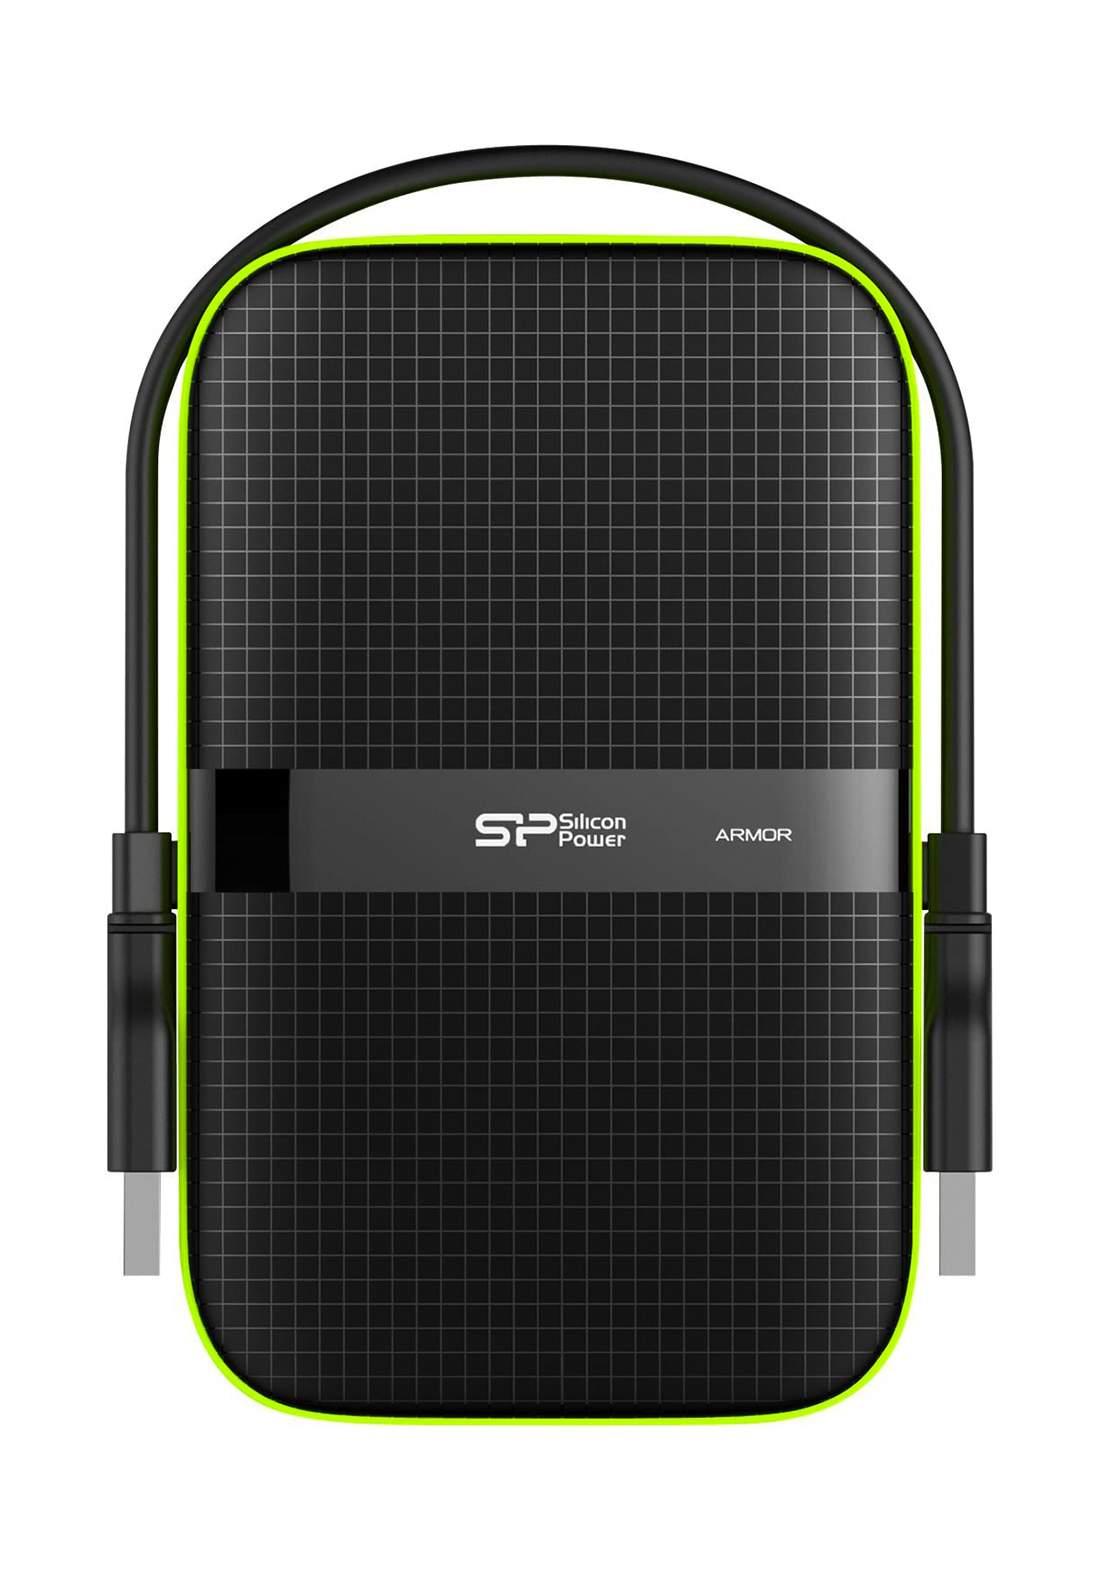 Silicon Power 5TB USB 3.0 Portable External Hard Drive - Black هارد خارجي محمول